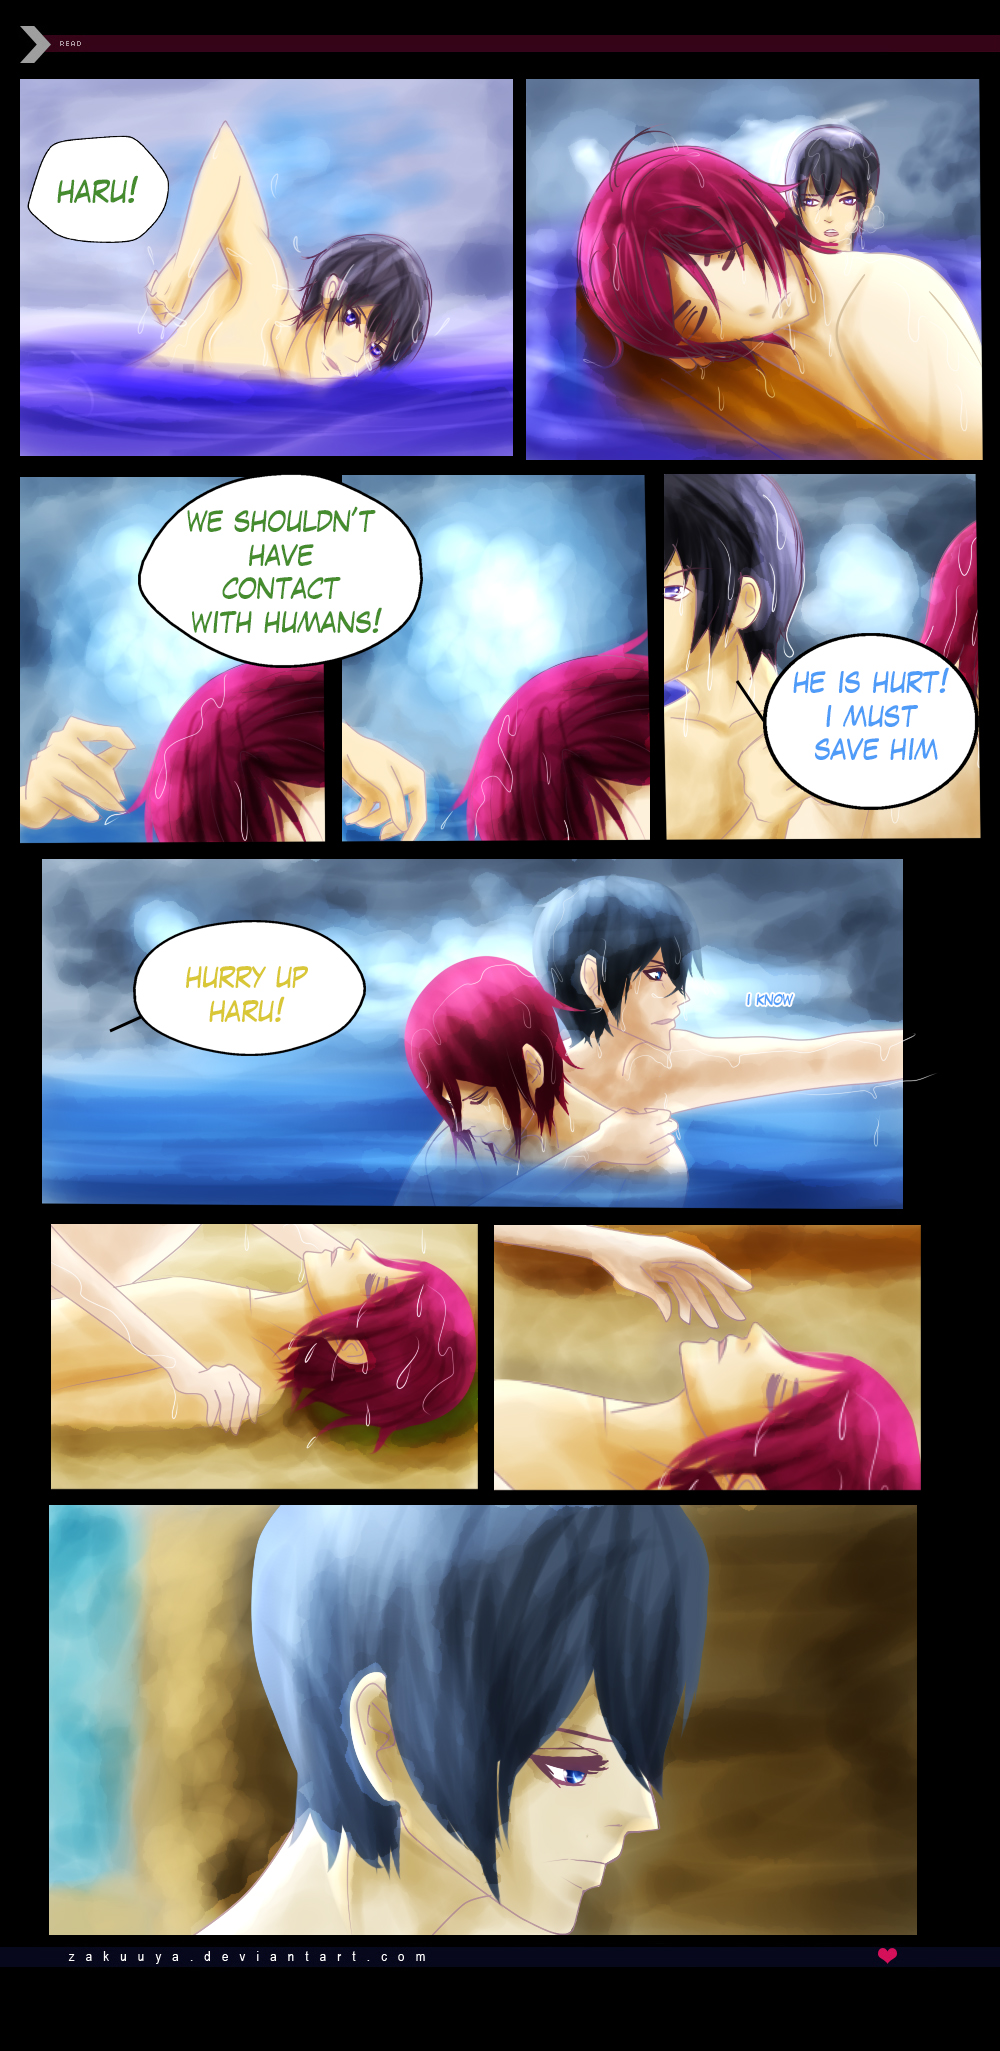 RinHaru: A Mermaid Tale 9 by Zakuuya